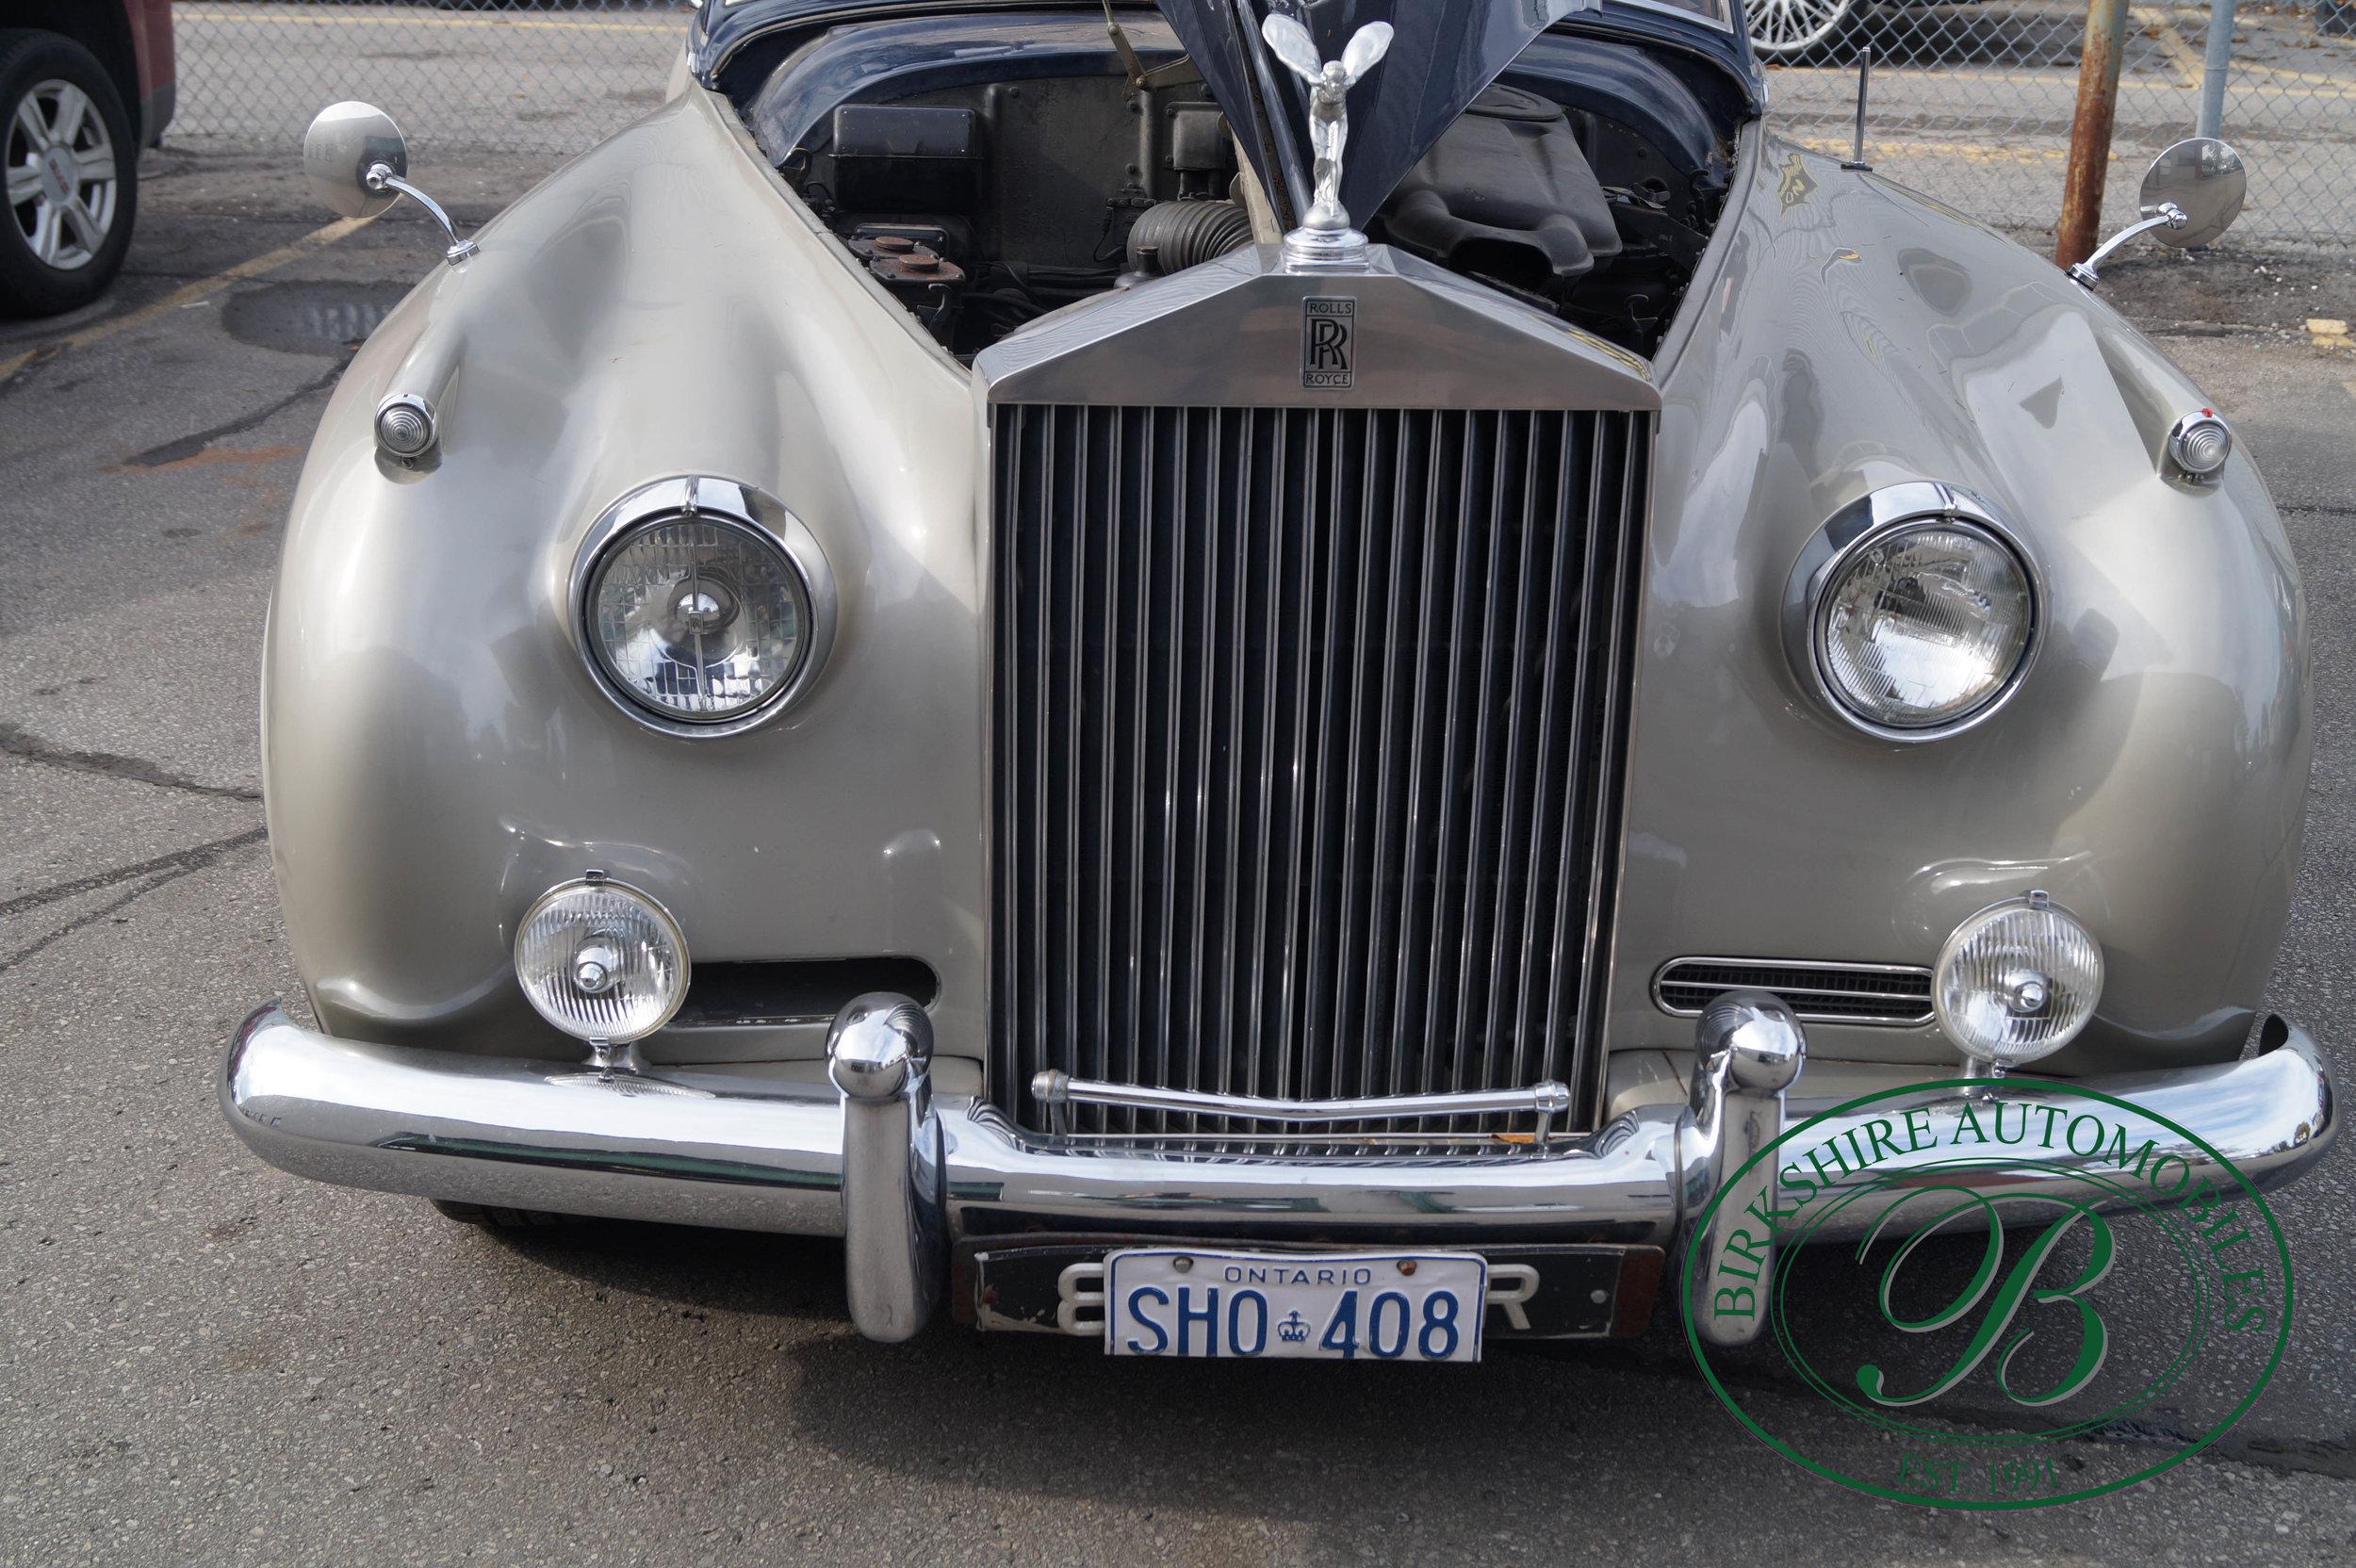 Birkshire Automobiles 1960 Rolls Royce Silver Cloud-34.jpg